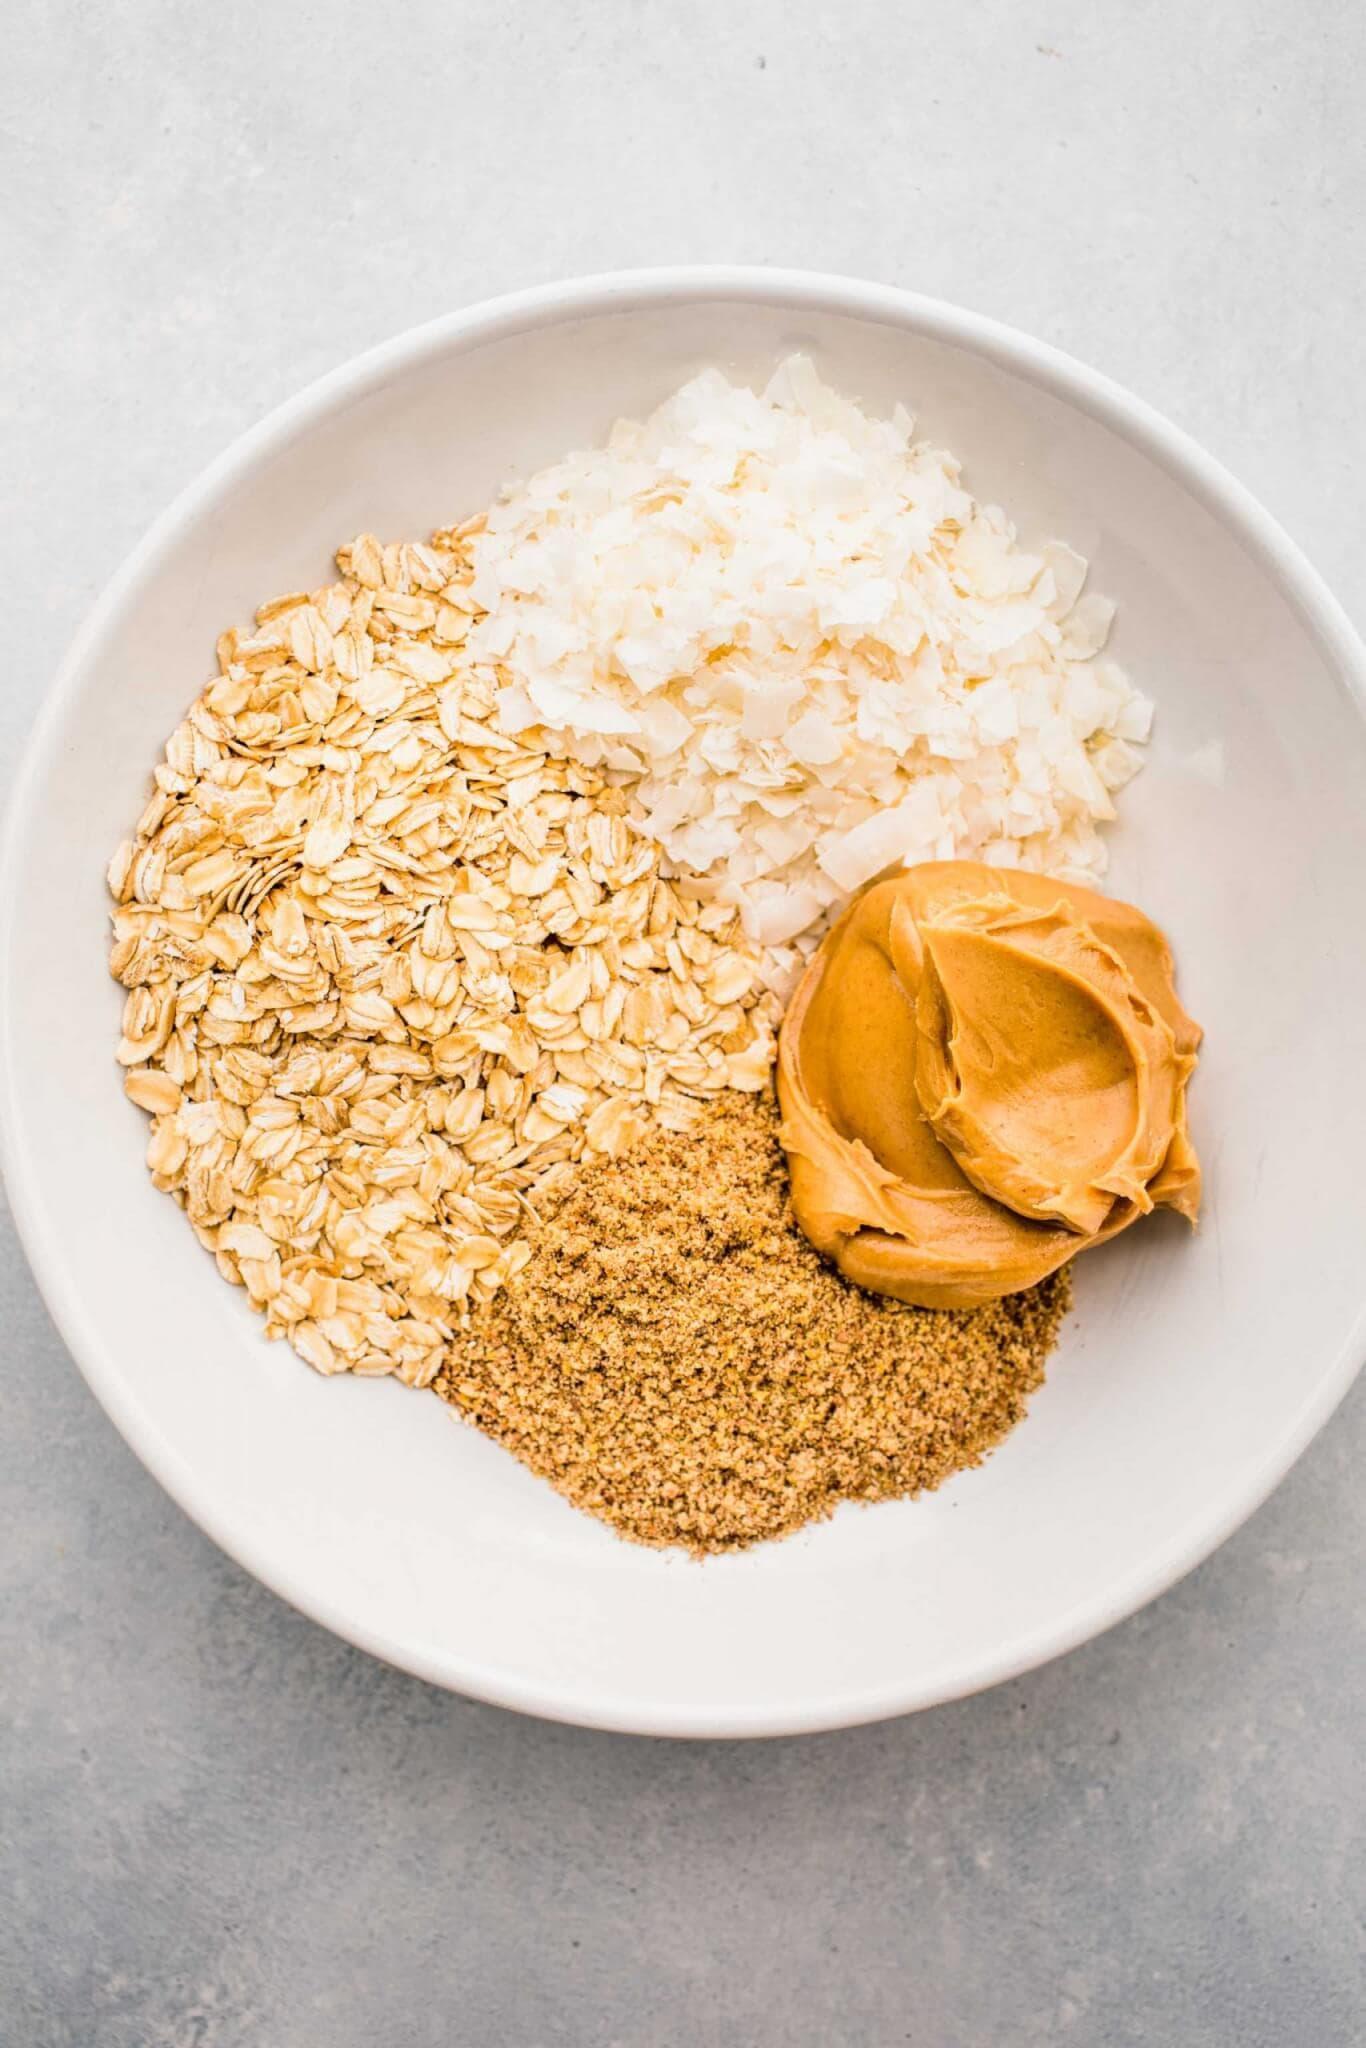 Energy bite ingredients in bowl before mixing.